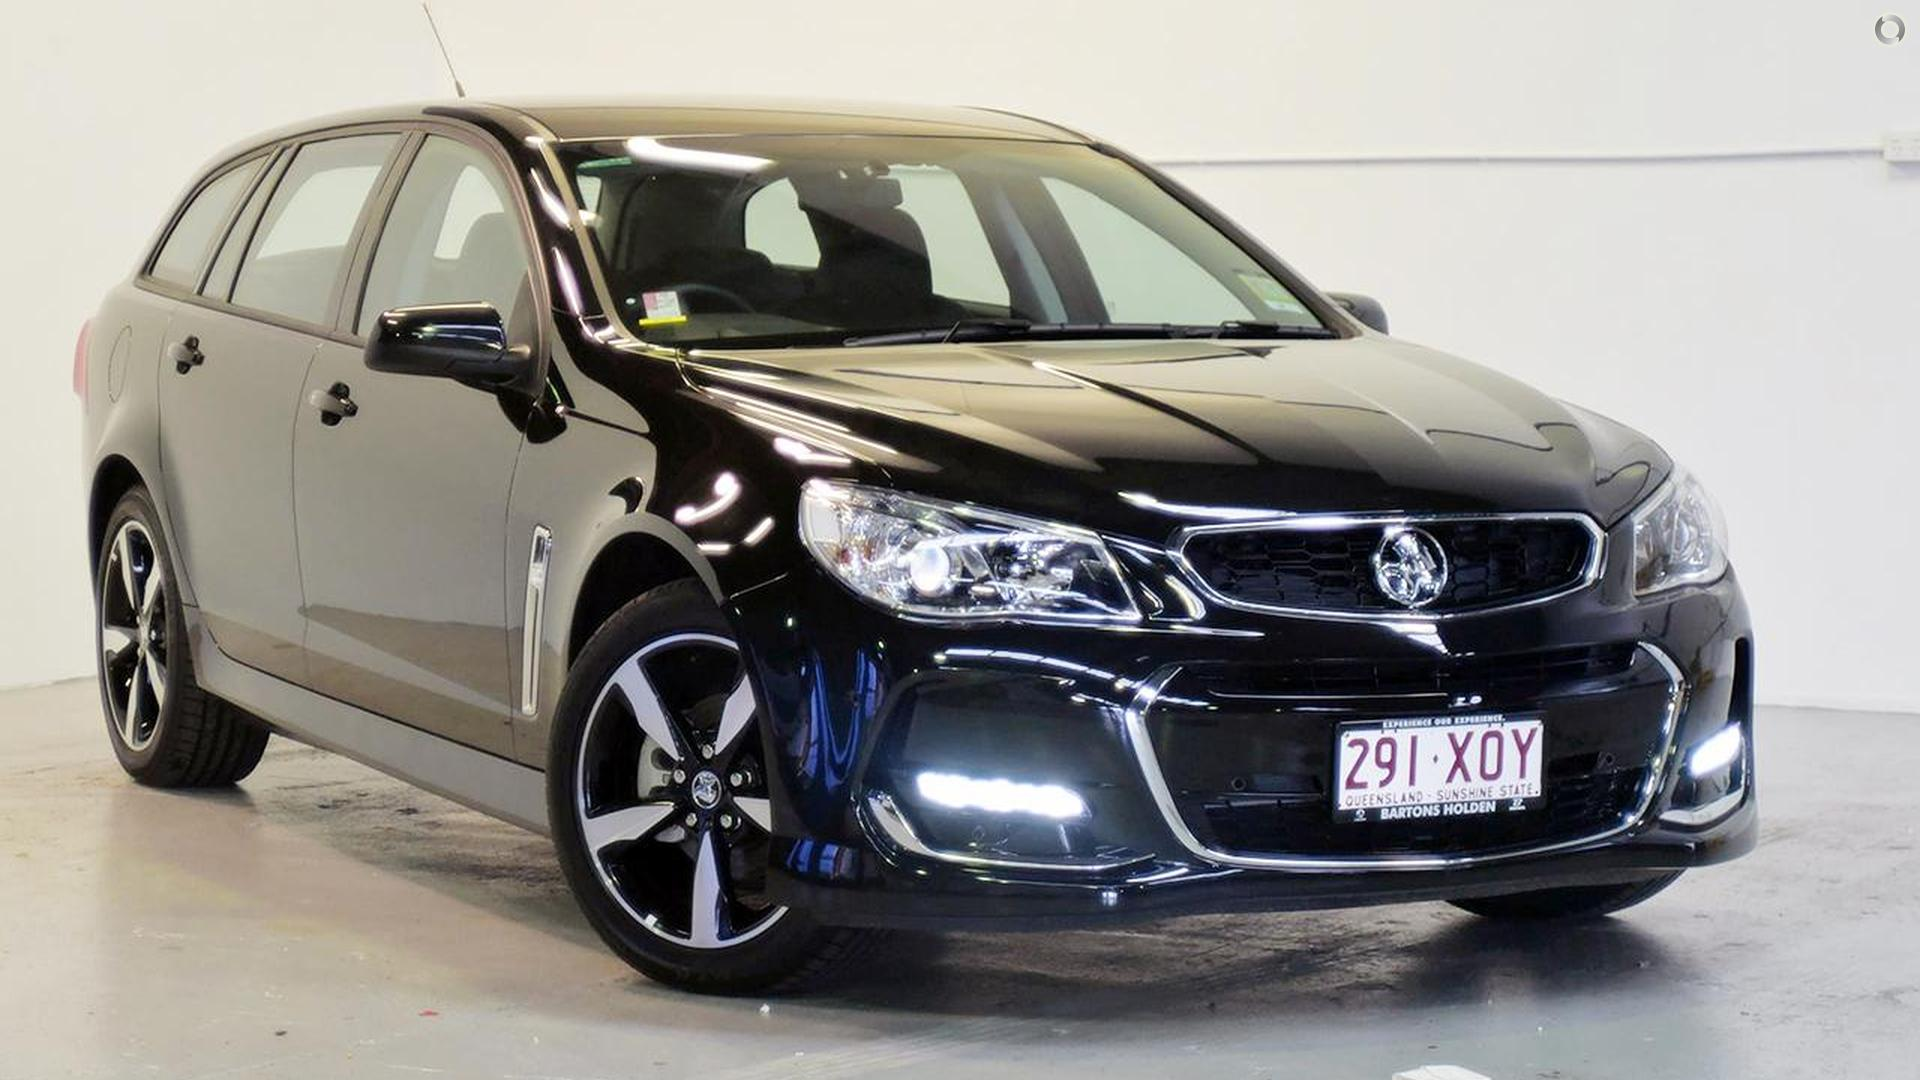 2017 Holden Commodore Sv6